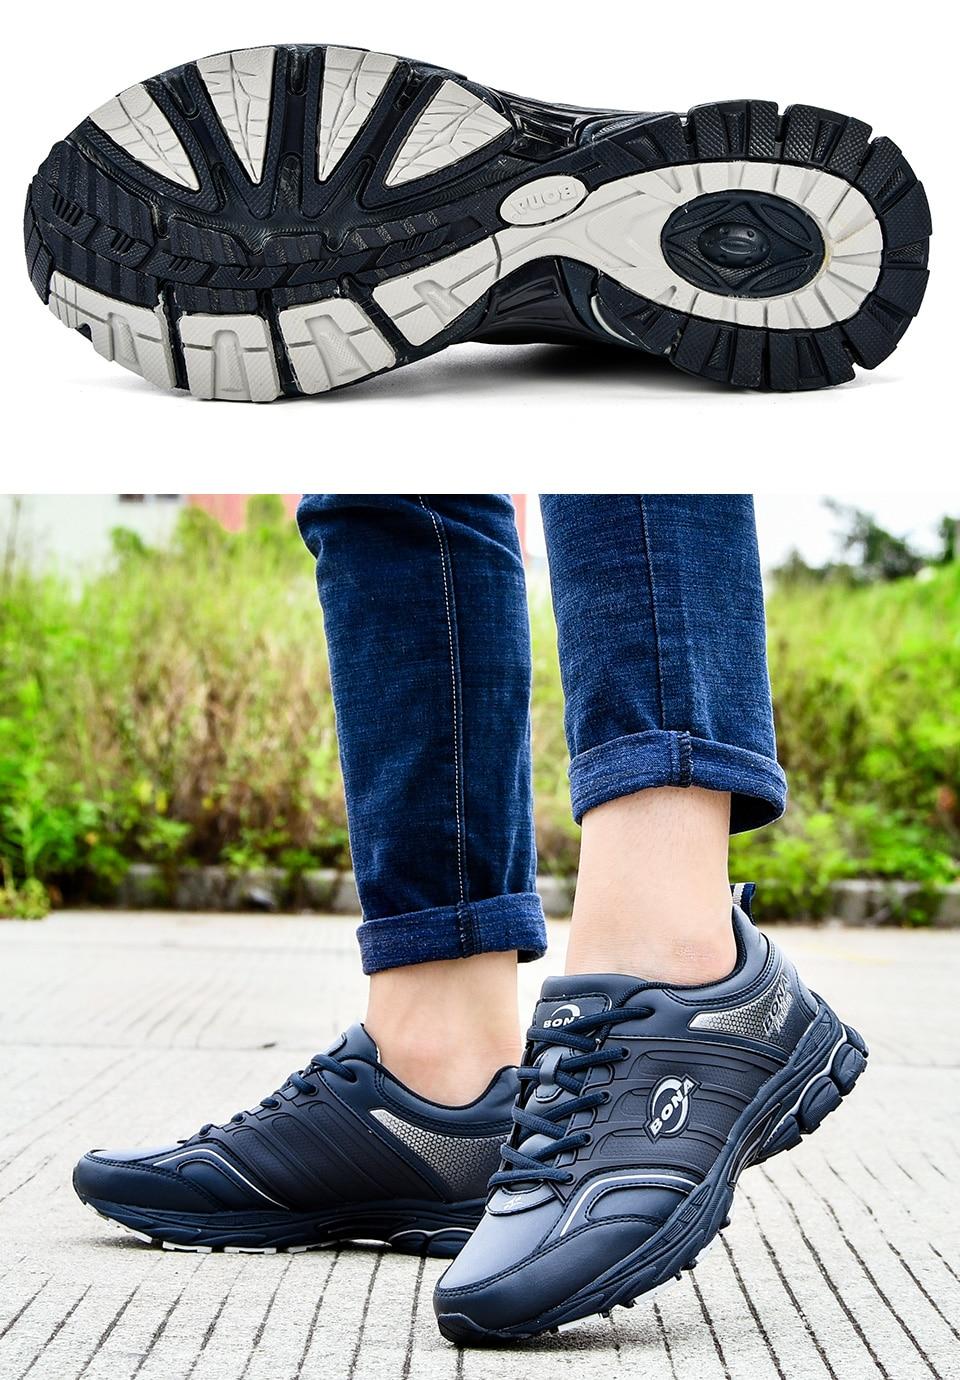 HTB1fOn5trZnBKNjSZFrq6yRLFXa3 BONA Men Casual Shoes Microfiber Man Flats Lace Up Breathable Men Fashion Classic Outdoor Shoes Zapatos De Hombre Free Shipping